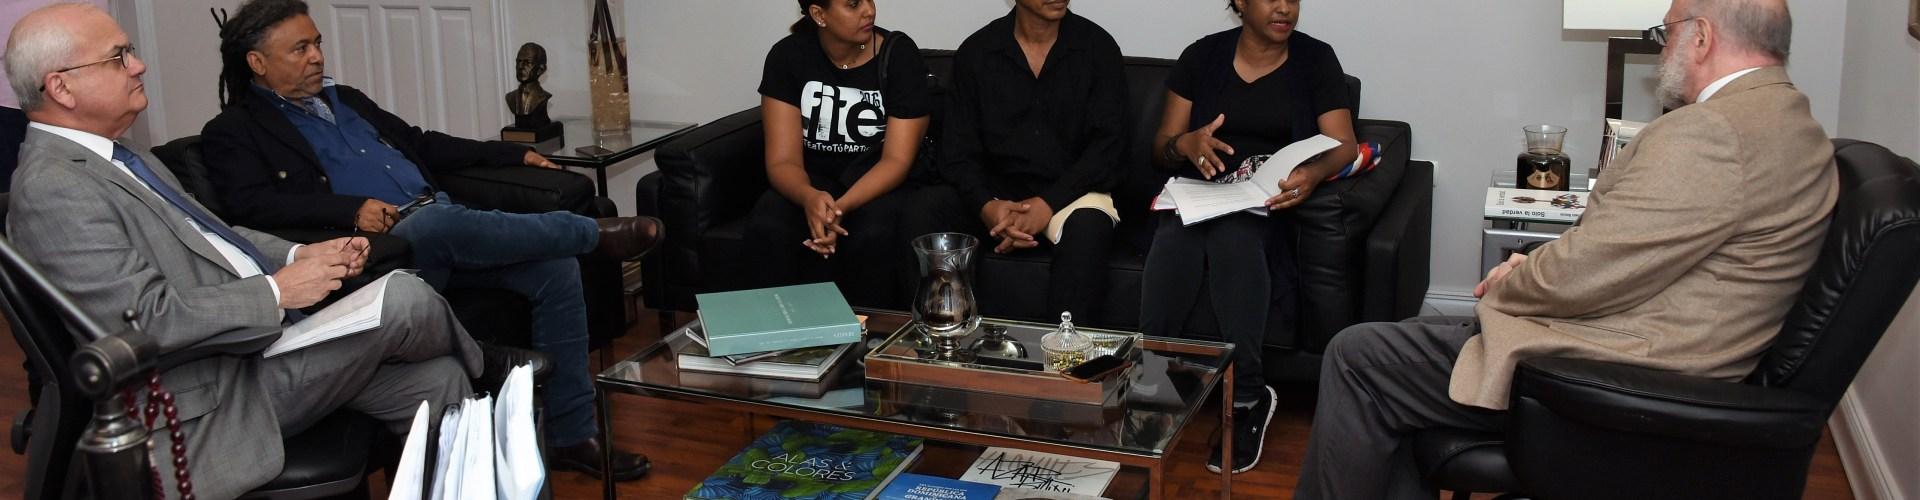 Ministro de Cultura recibe grupo teatristas